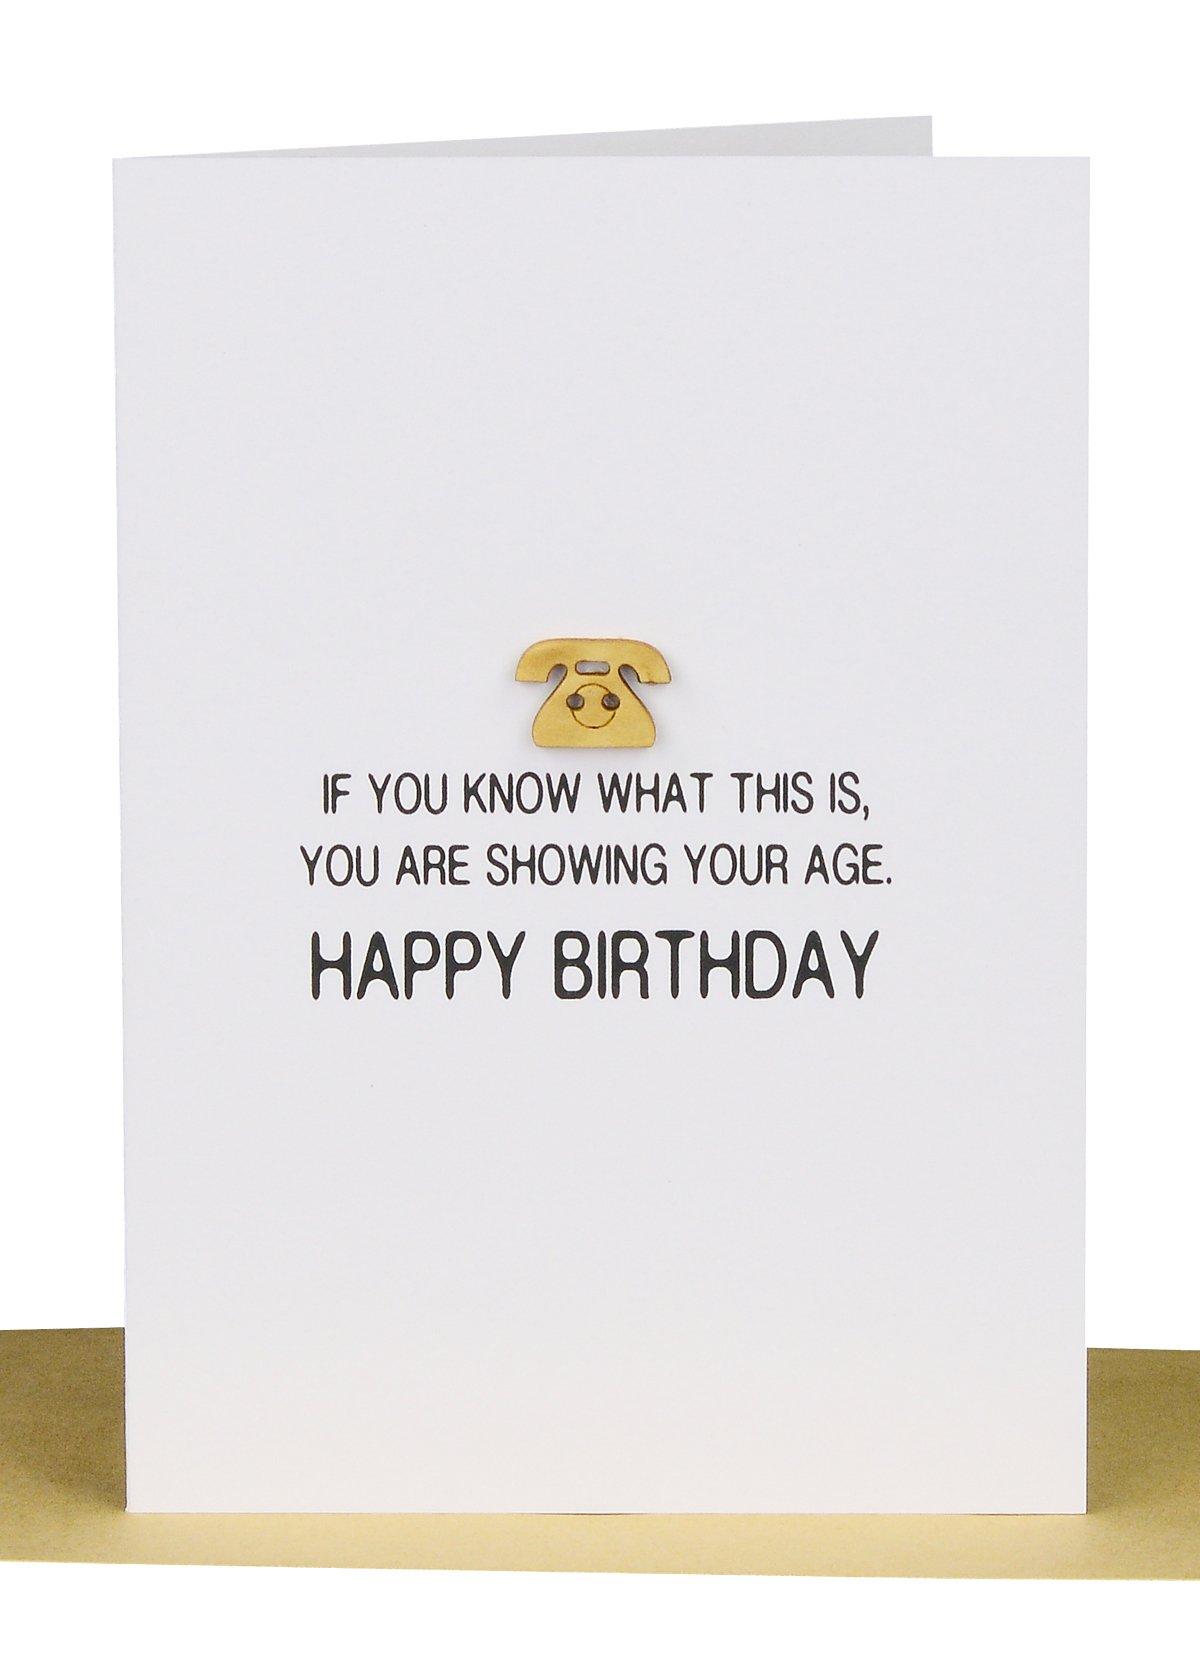 Australian made cards wholesale birthday greeting cards lils wholesale birthday greeting cards m4hsunfo